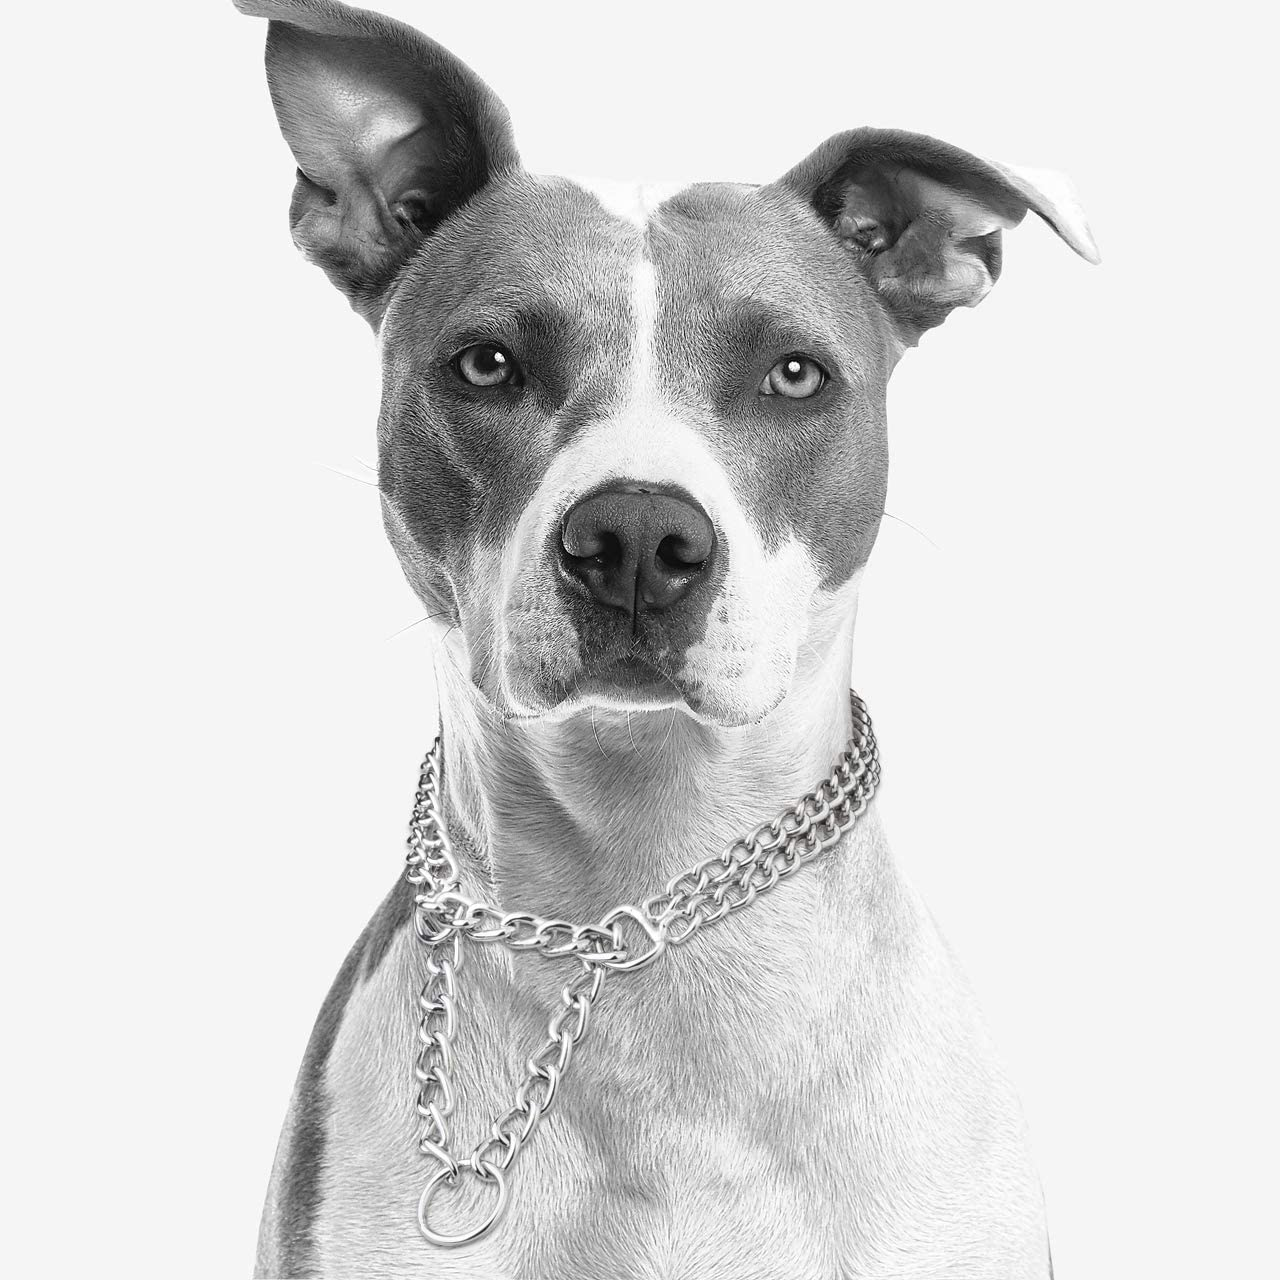 Mogoko Stainless Steel Double Chain Martingale Dog Collar Metal Dog Choker Chain Collar for Pet Training